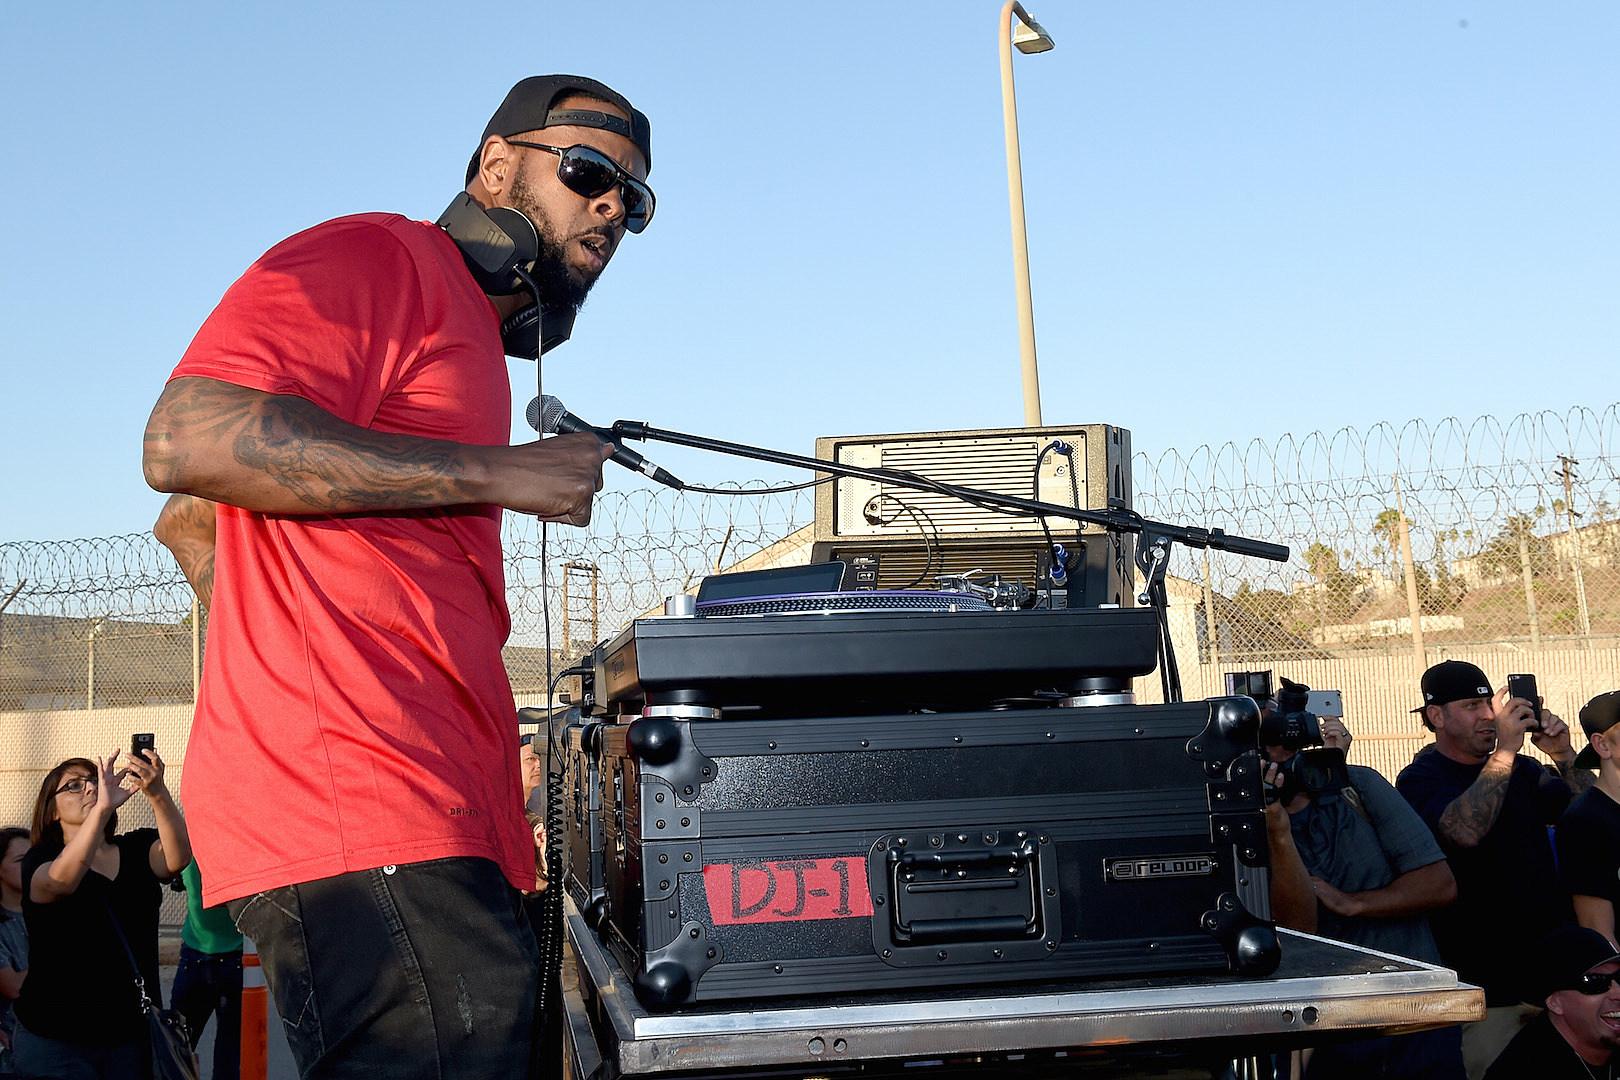 Prophets of Rage's DJ Lord + Peyote Cody Unite for 'Metal Shrapnel Moshtape, Vol. 2′